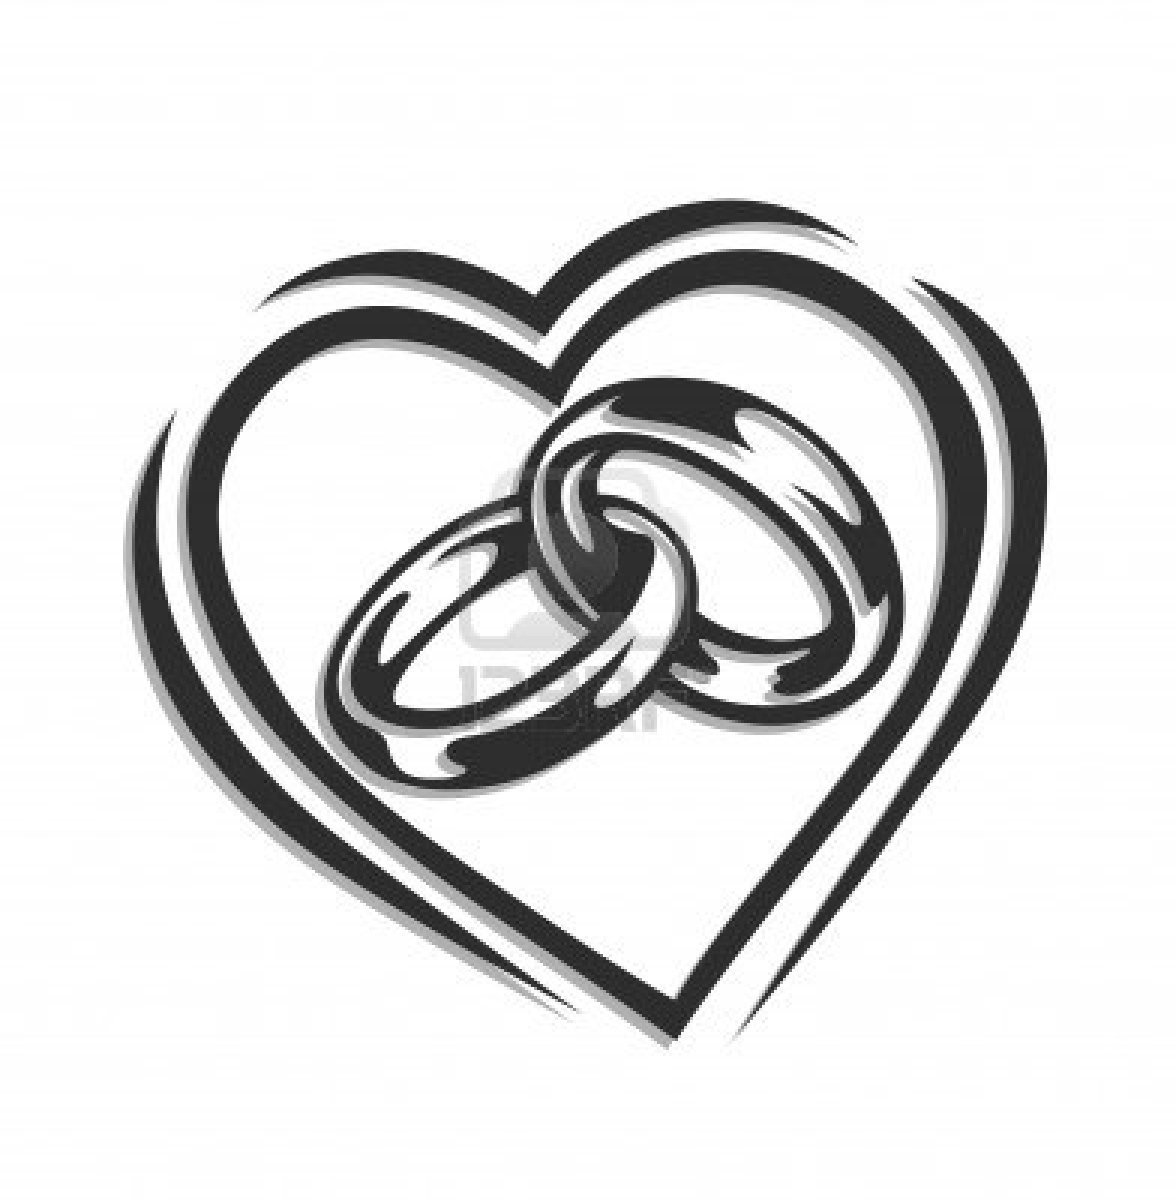 Interlocking wedding rings pin interlocking wedding rings clip clipart